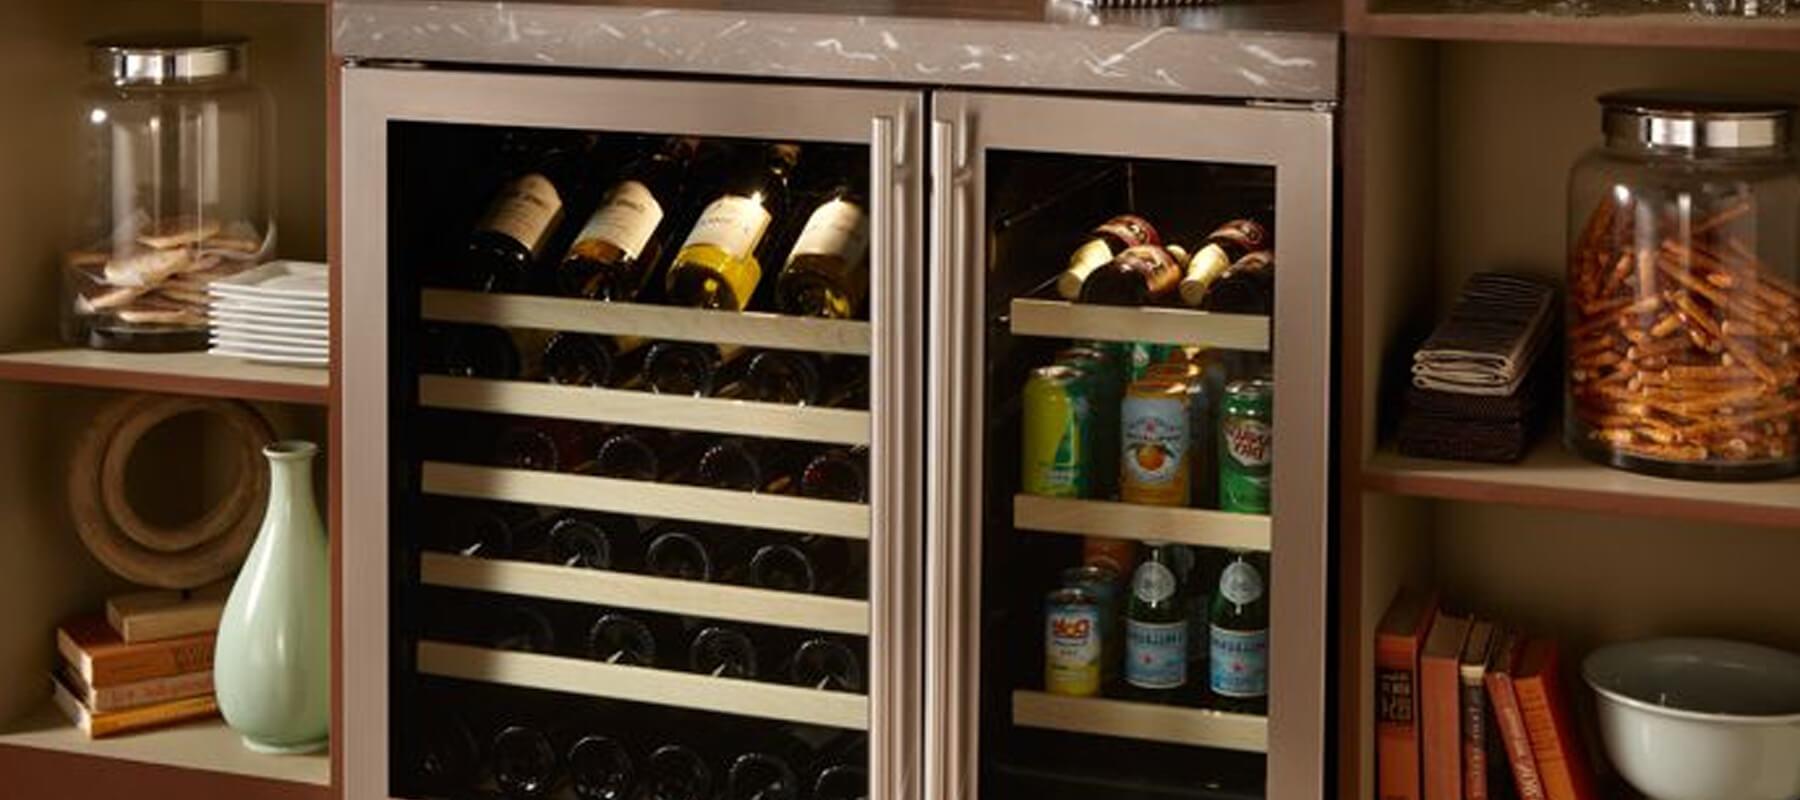 Built in Wine Refrigerator Undercounter Laguna Beach | Built-in Refrigerator Repair